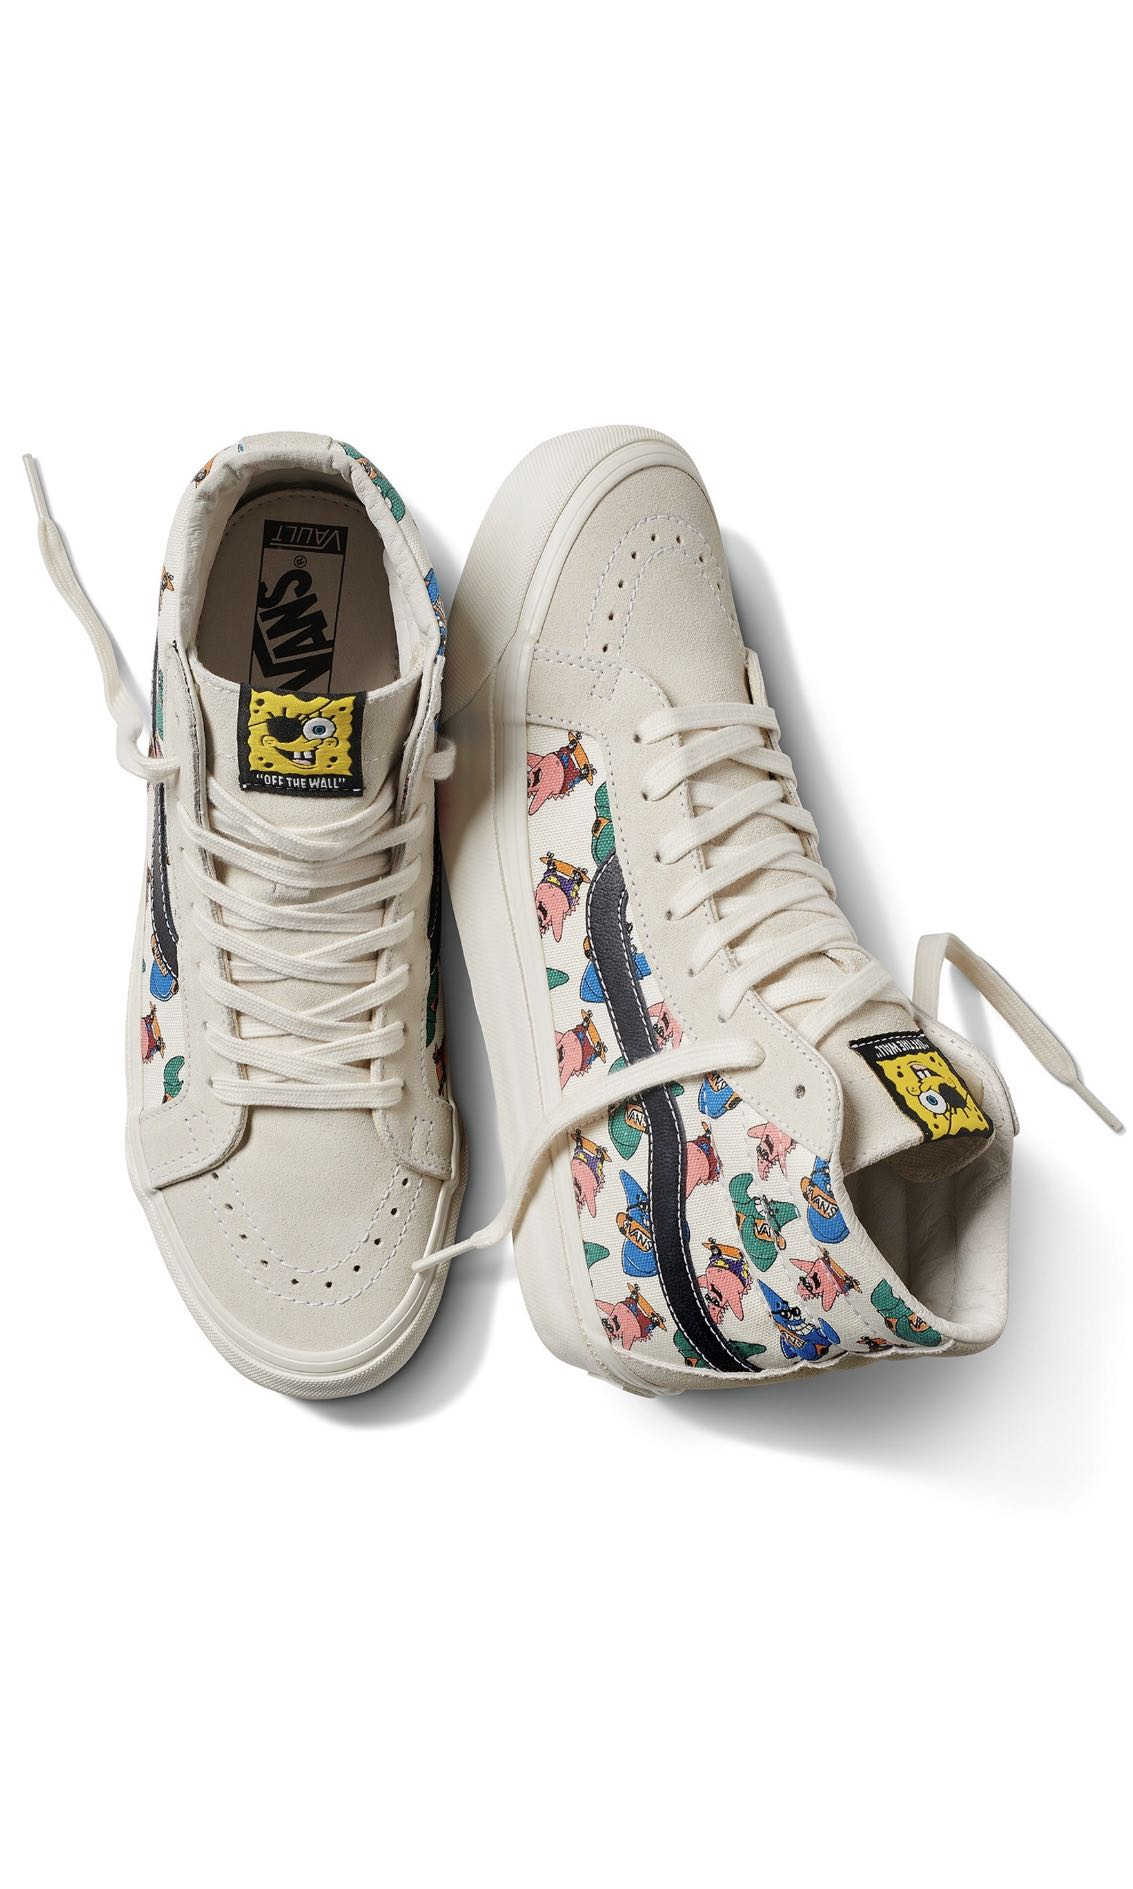 8c92fc1d77 Home · Men s Fashion · Footwear · Sneakers. photo photo photo photo